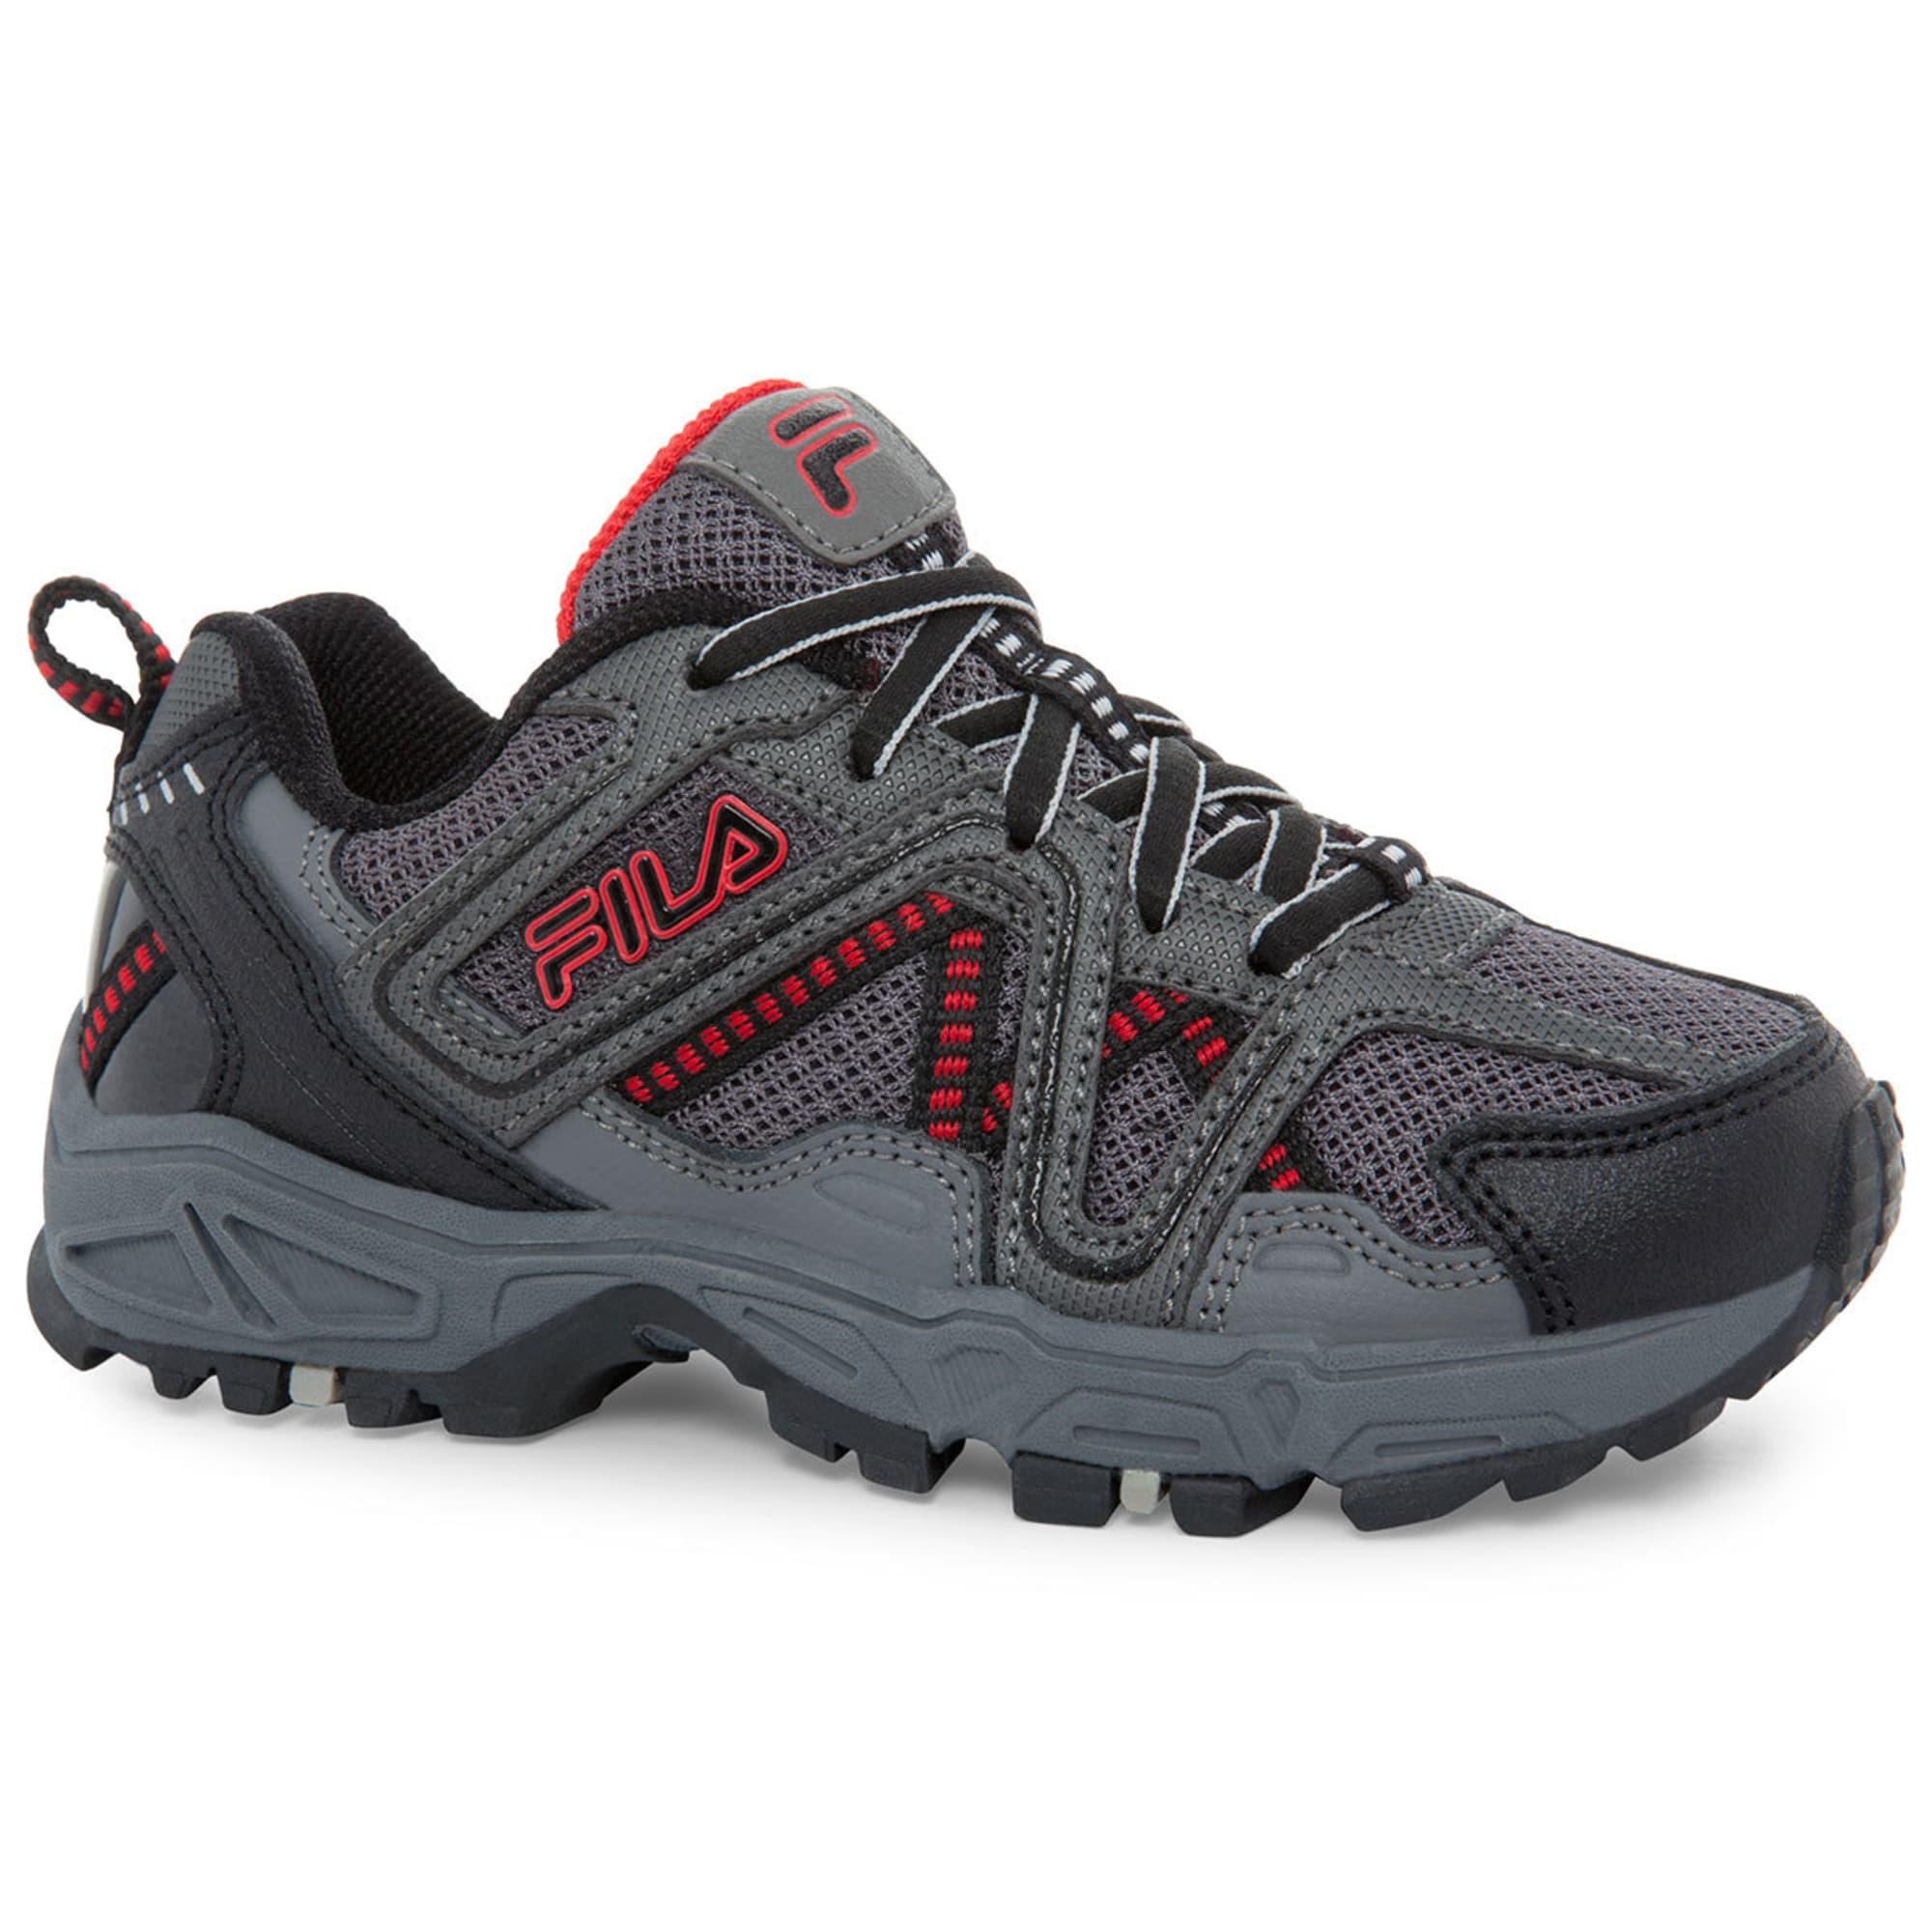 FILA Boys' Ascente 15 Running Shoes, BlackGreyRed Bob's